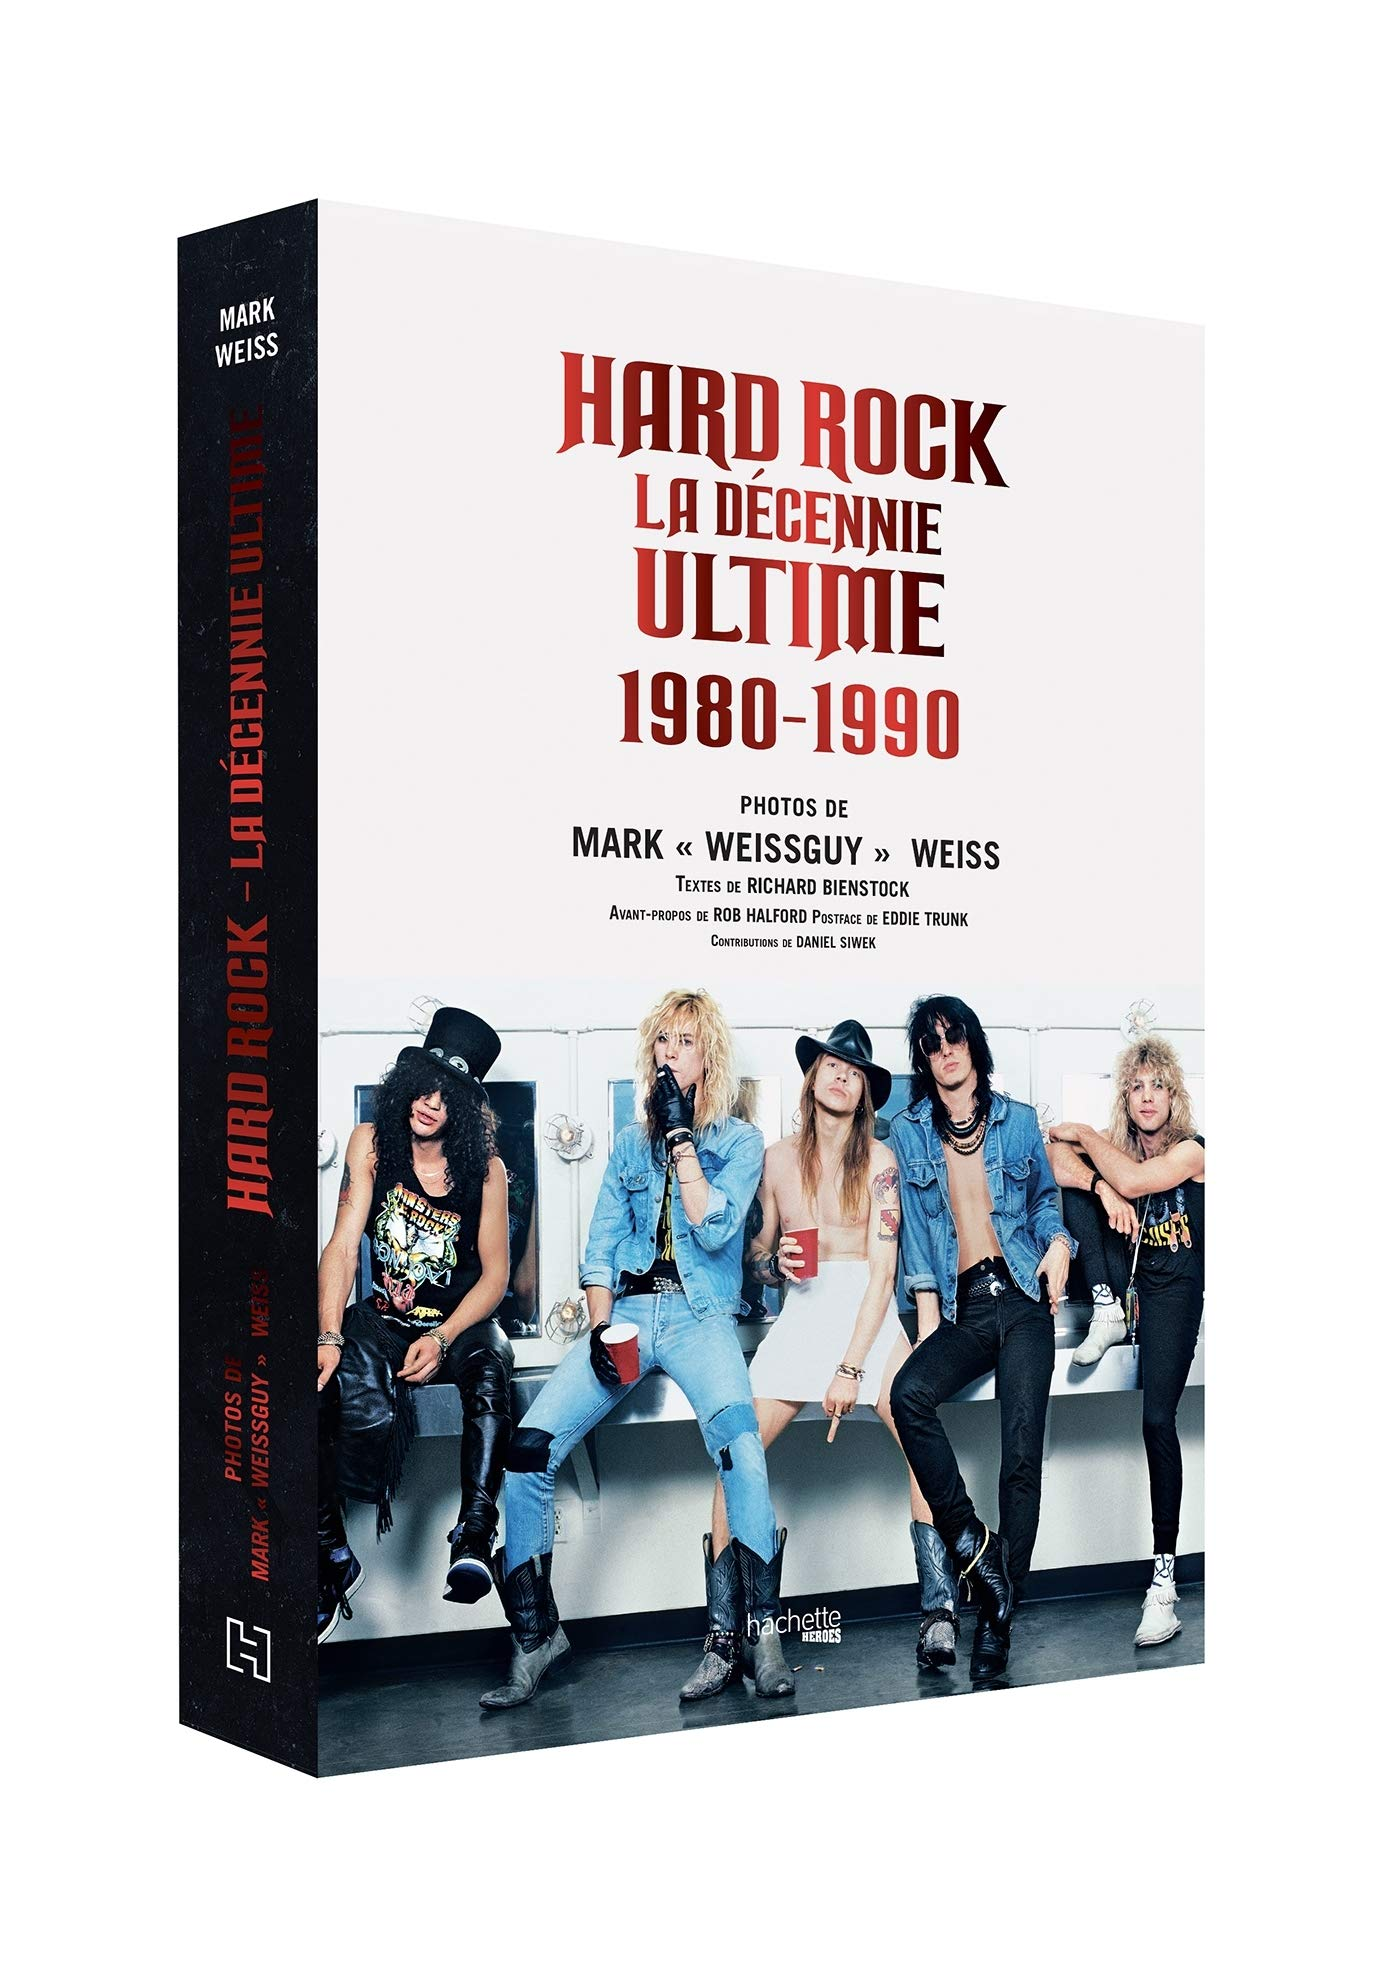 Libros de Rock - Página 10 71-1LNt7SDL